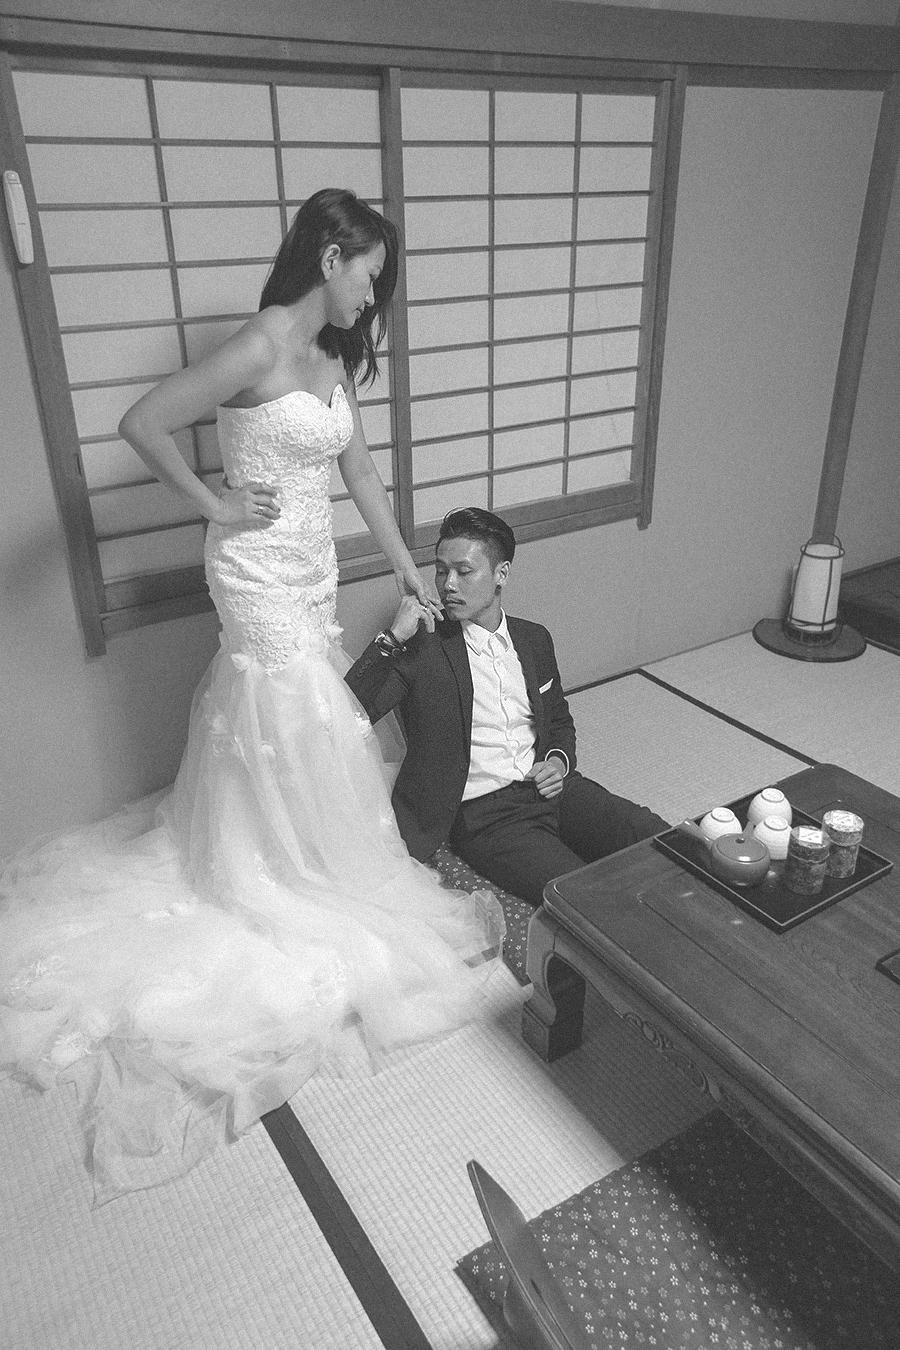 tokyo hakone japan spring sakura . engagement wedding photography by kurt ahs . ns + eu . 03901.jpg